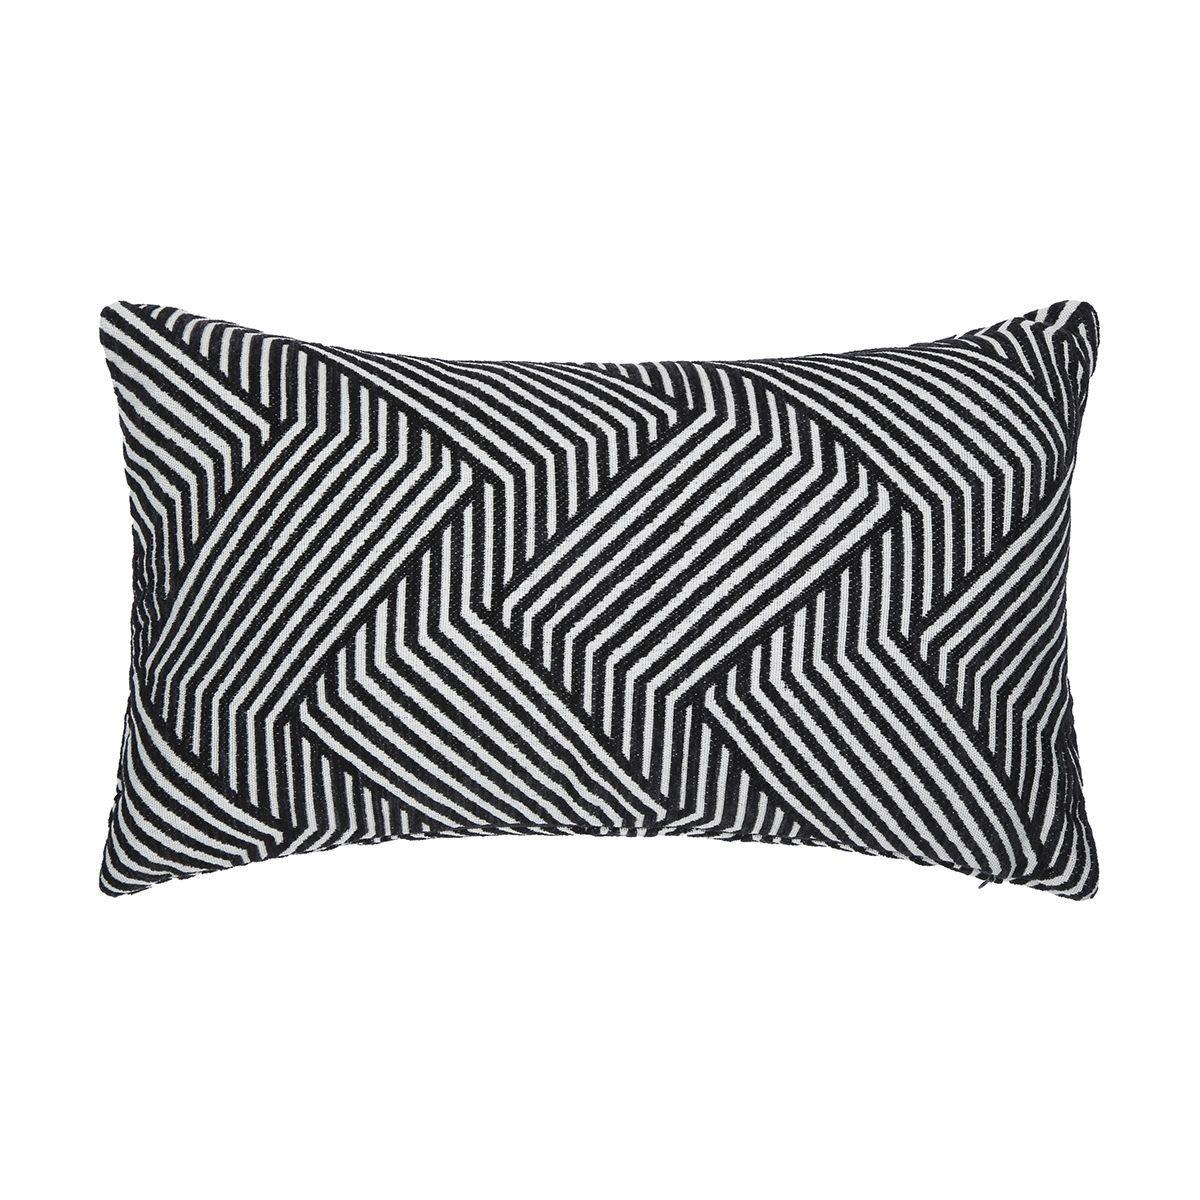 Breakfast Chenille Cushion Geo Kmart Cream cushions